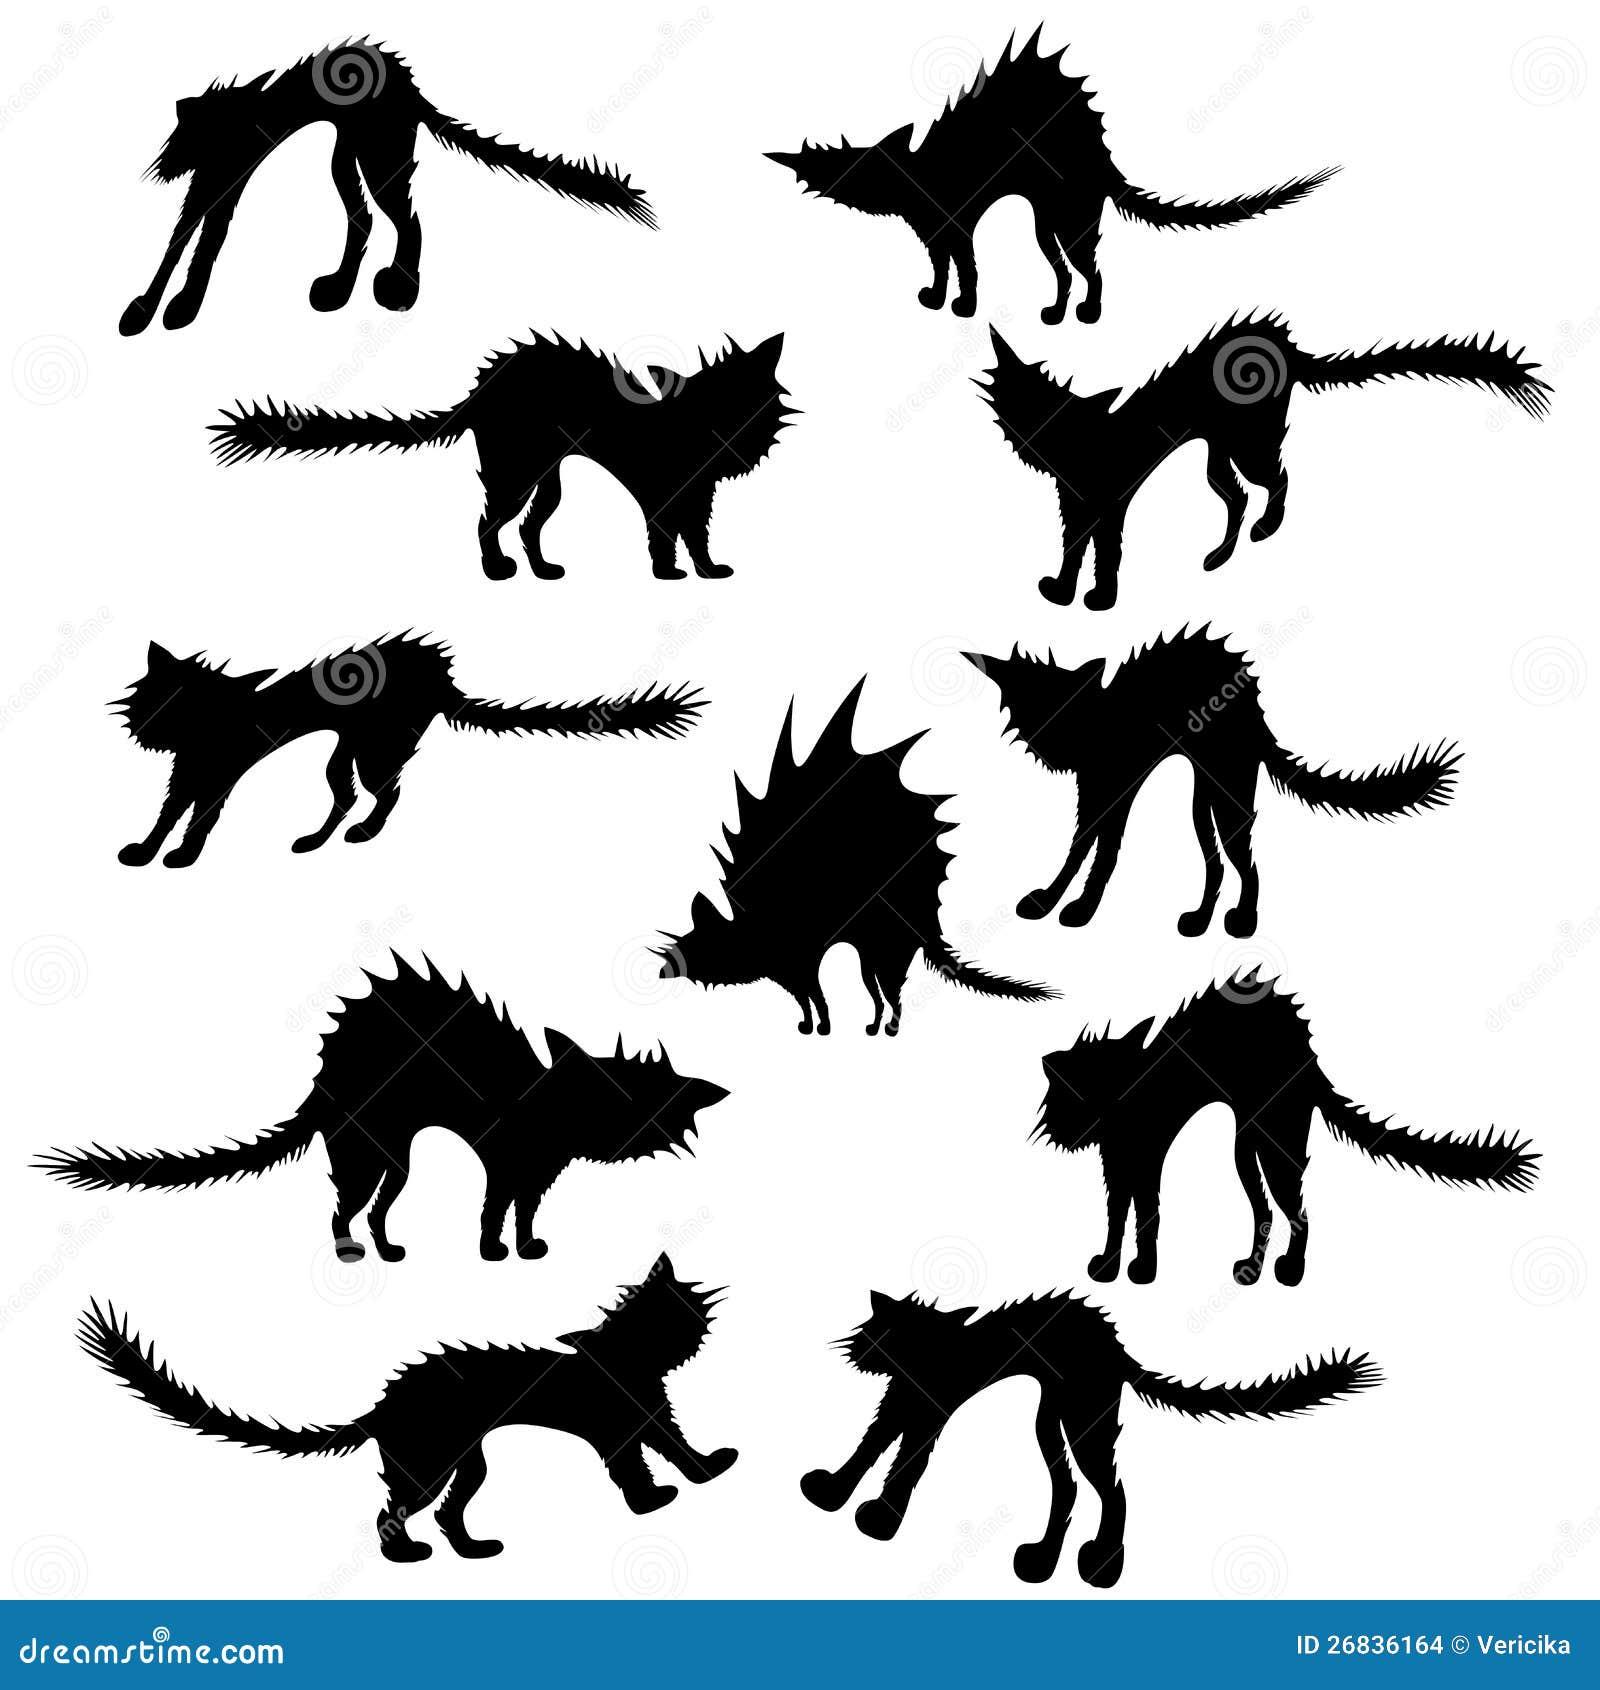 silueta de gato negro - photo #33